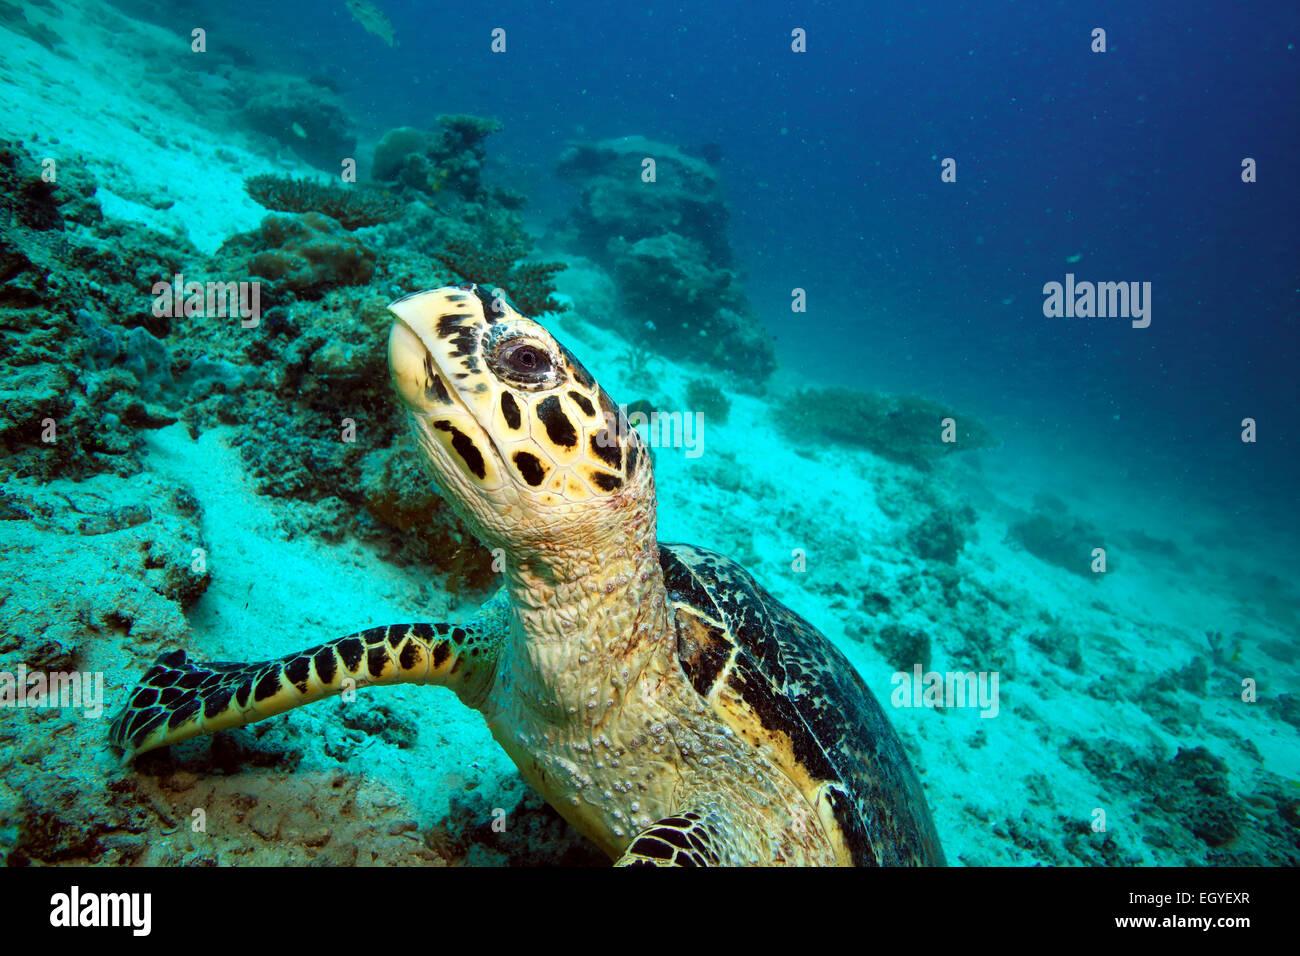 Hawksbill sea turtle underwater at Mabul Island, Borneo - Stock Image